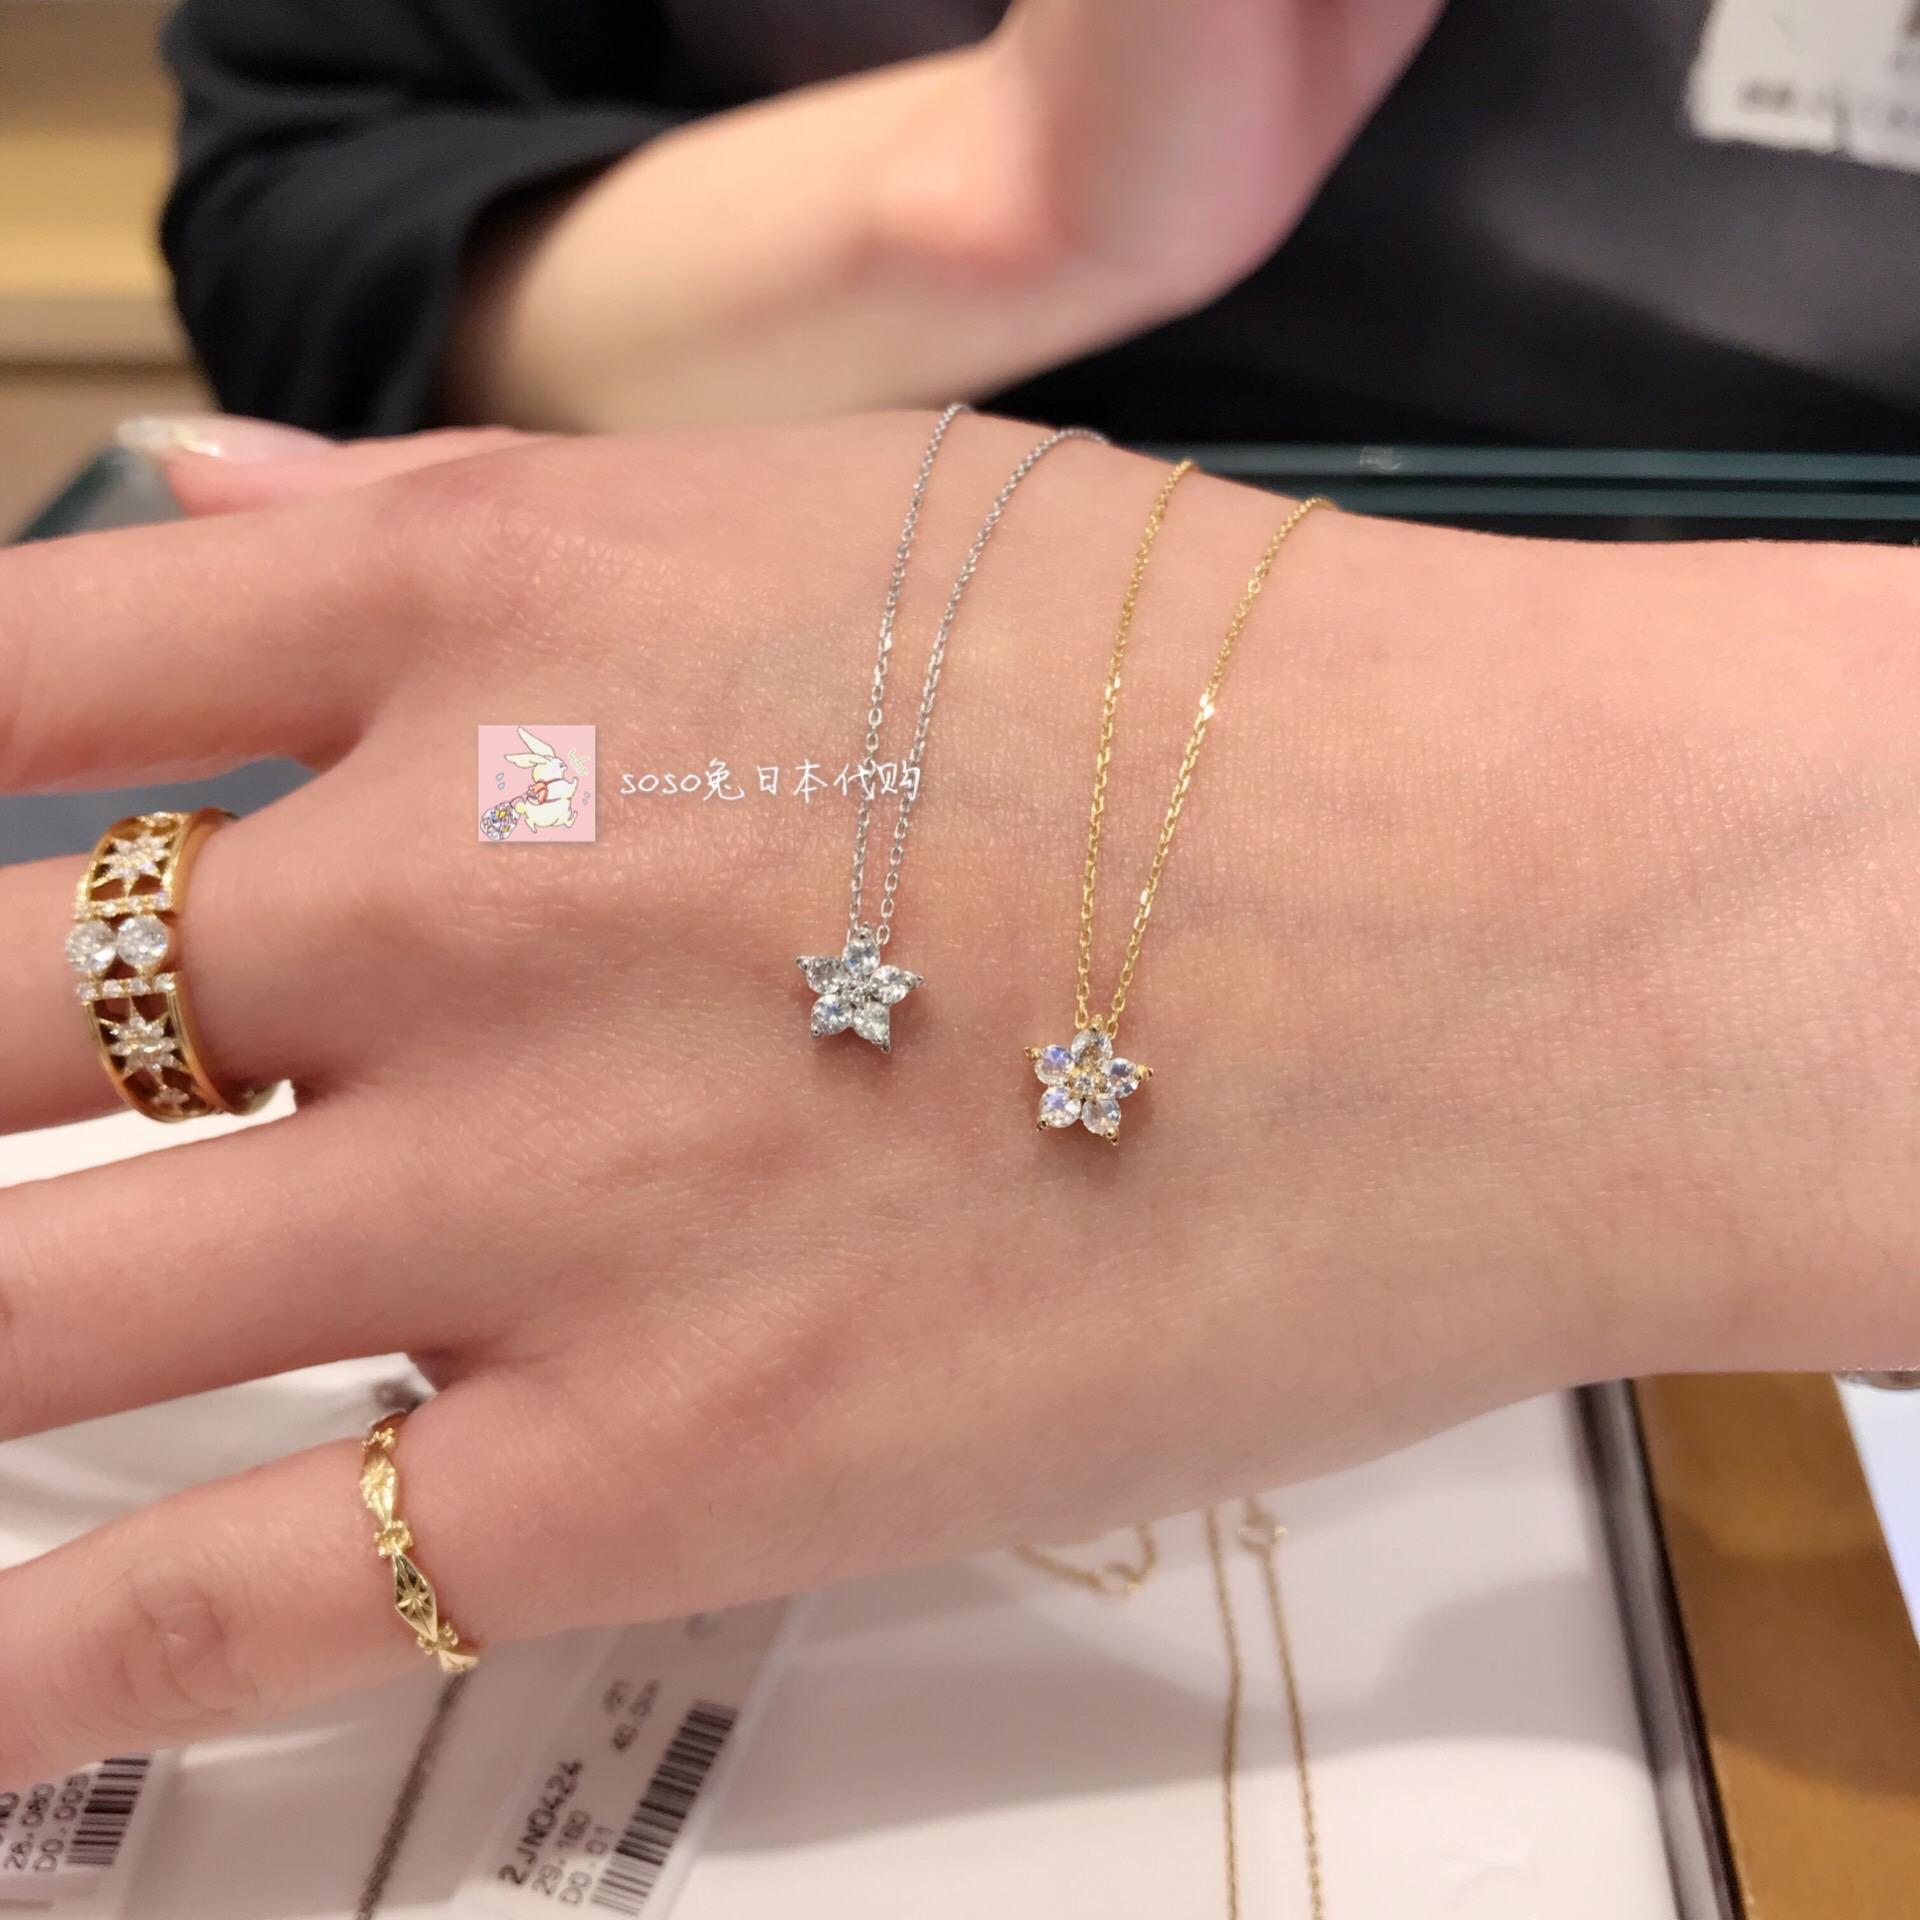 Buy Jewelry, Wholesale Jewelry, Cheap Jewelry from China Jewelry ...